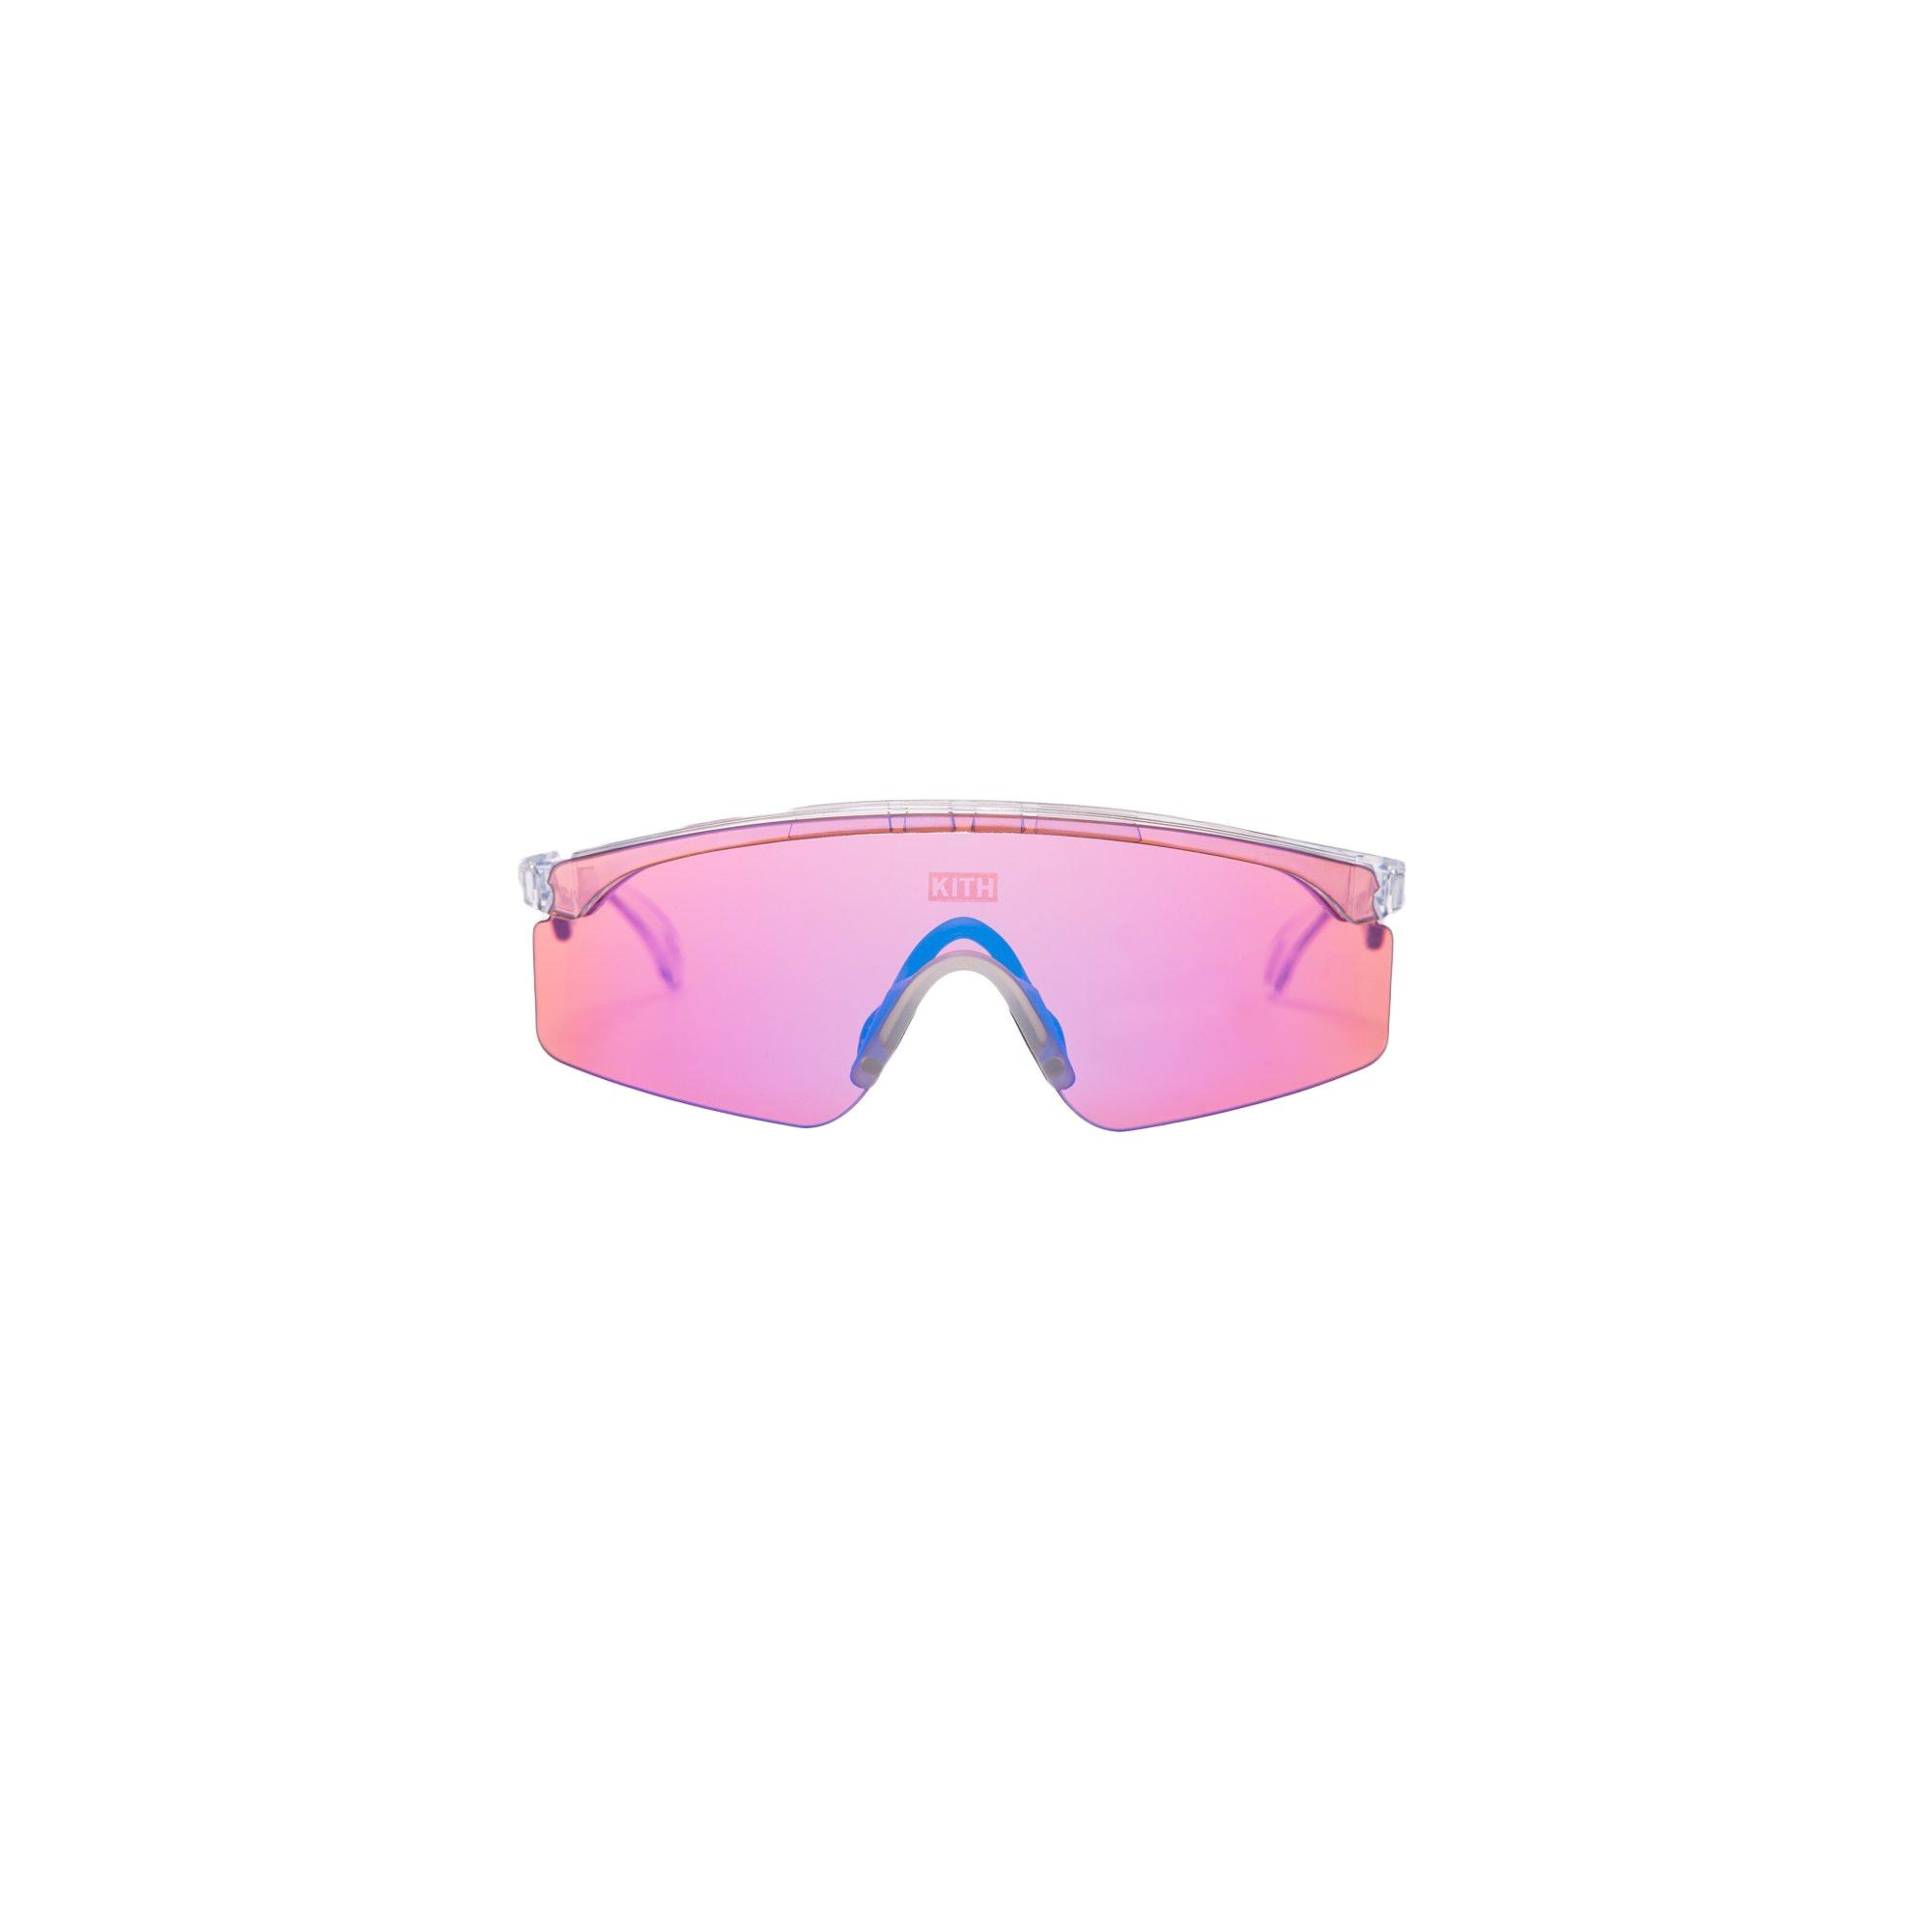 Kith x Oakley Razorblade Sunglasses Pink